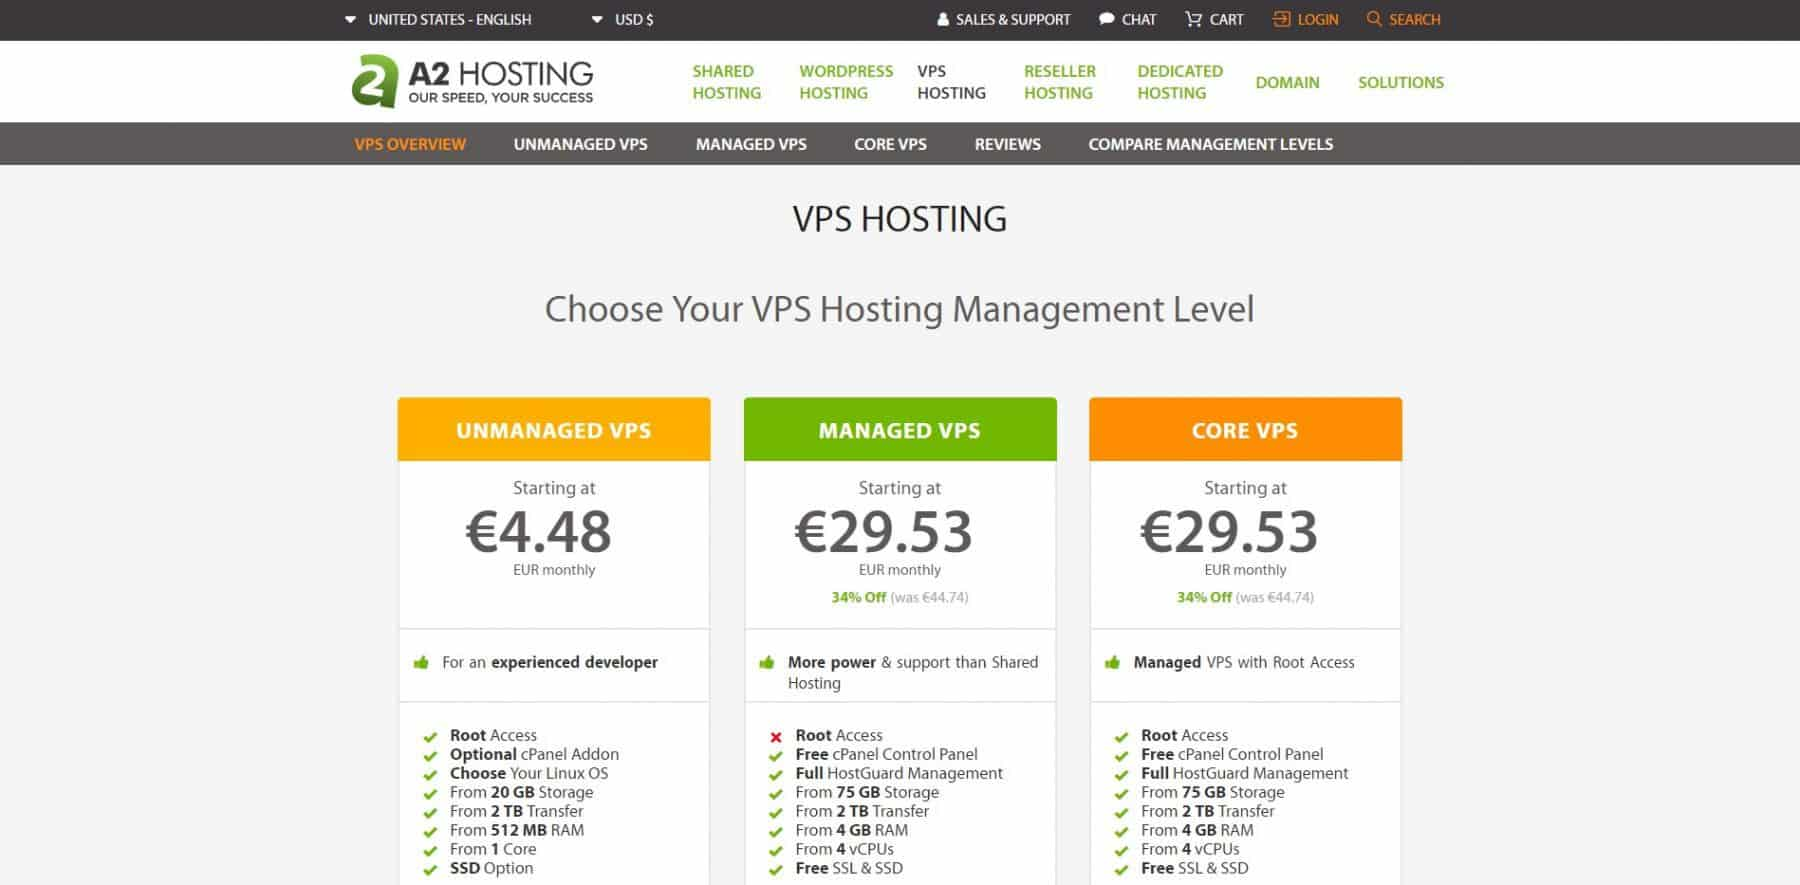 a2 hosting vps hosting